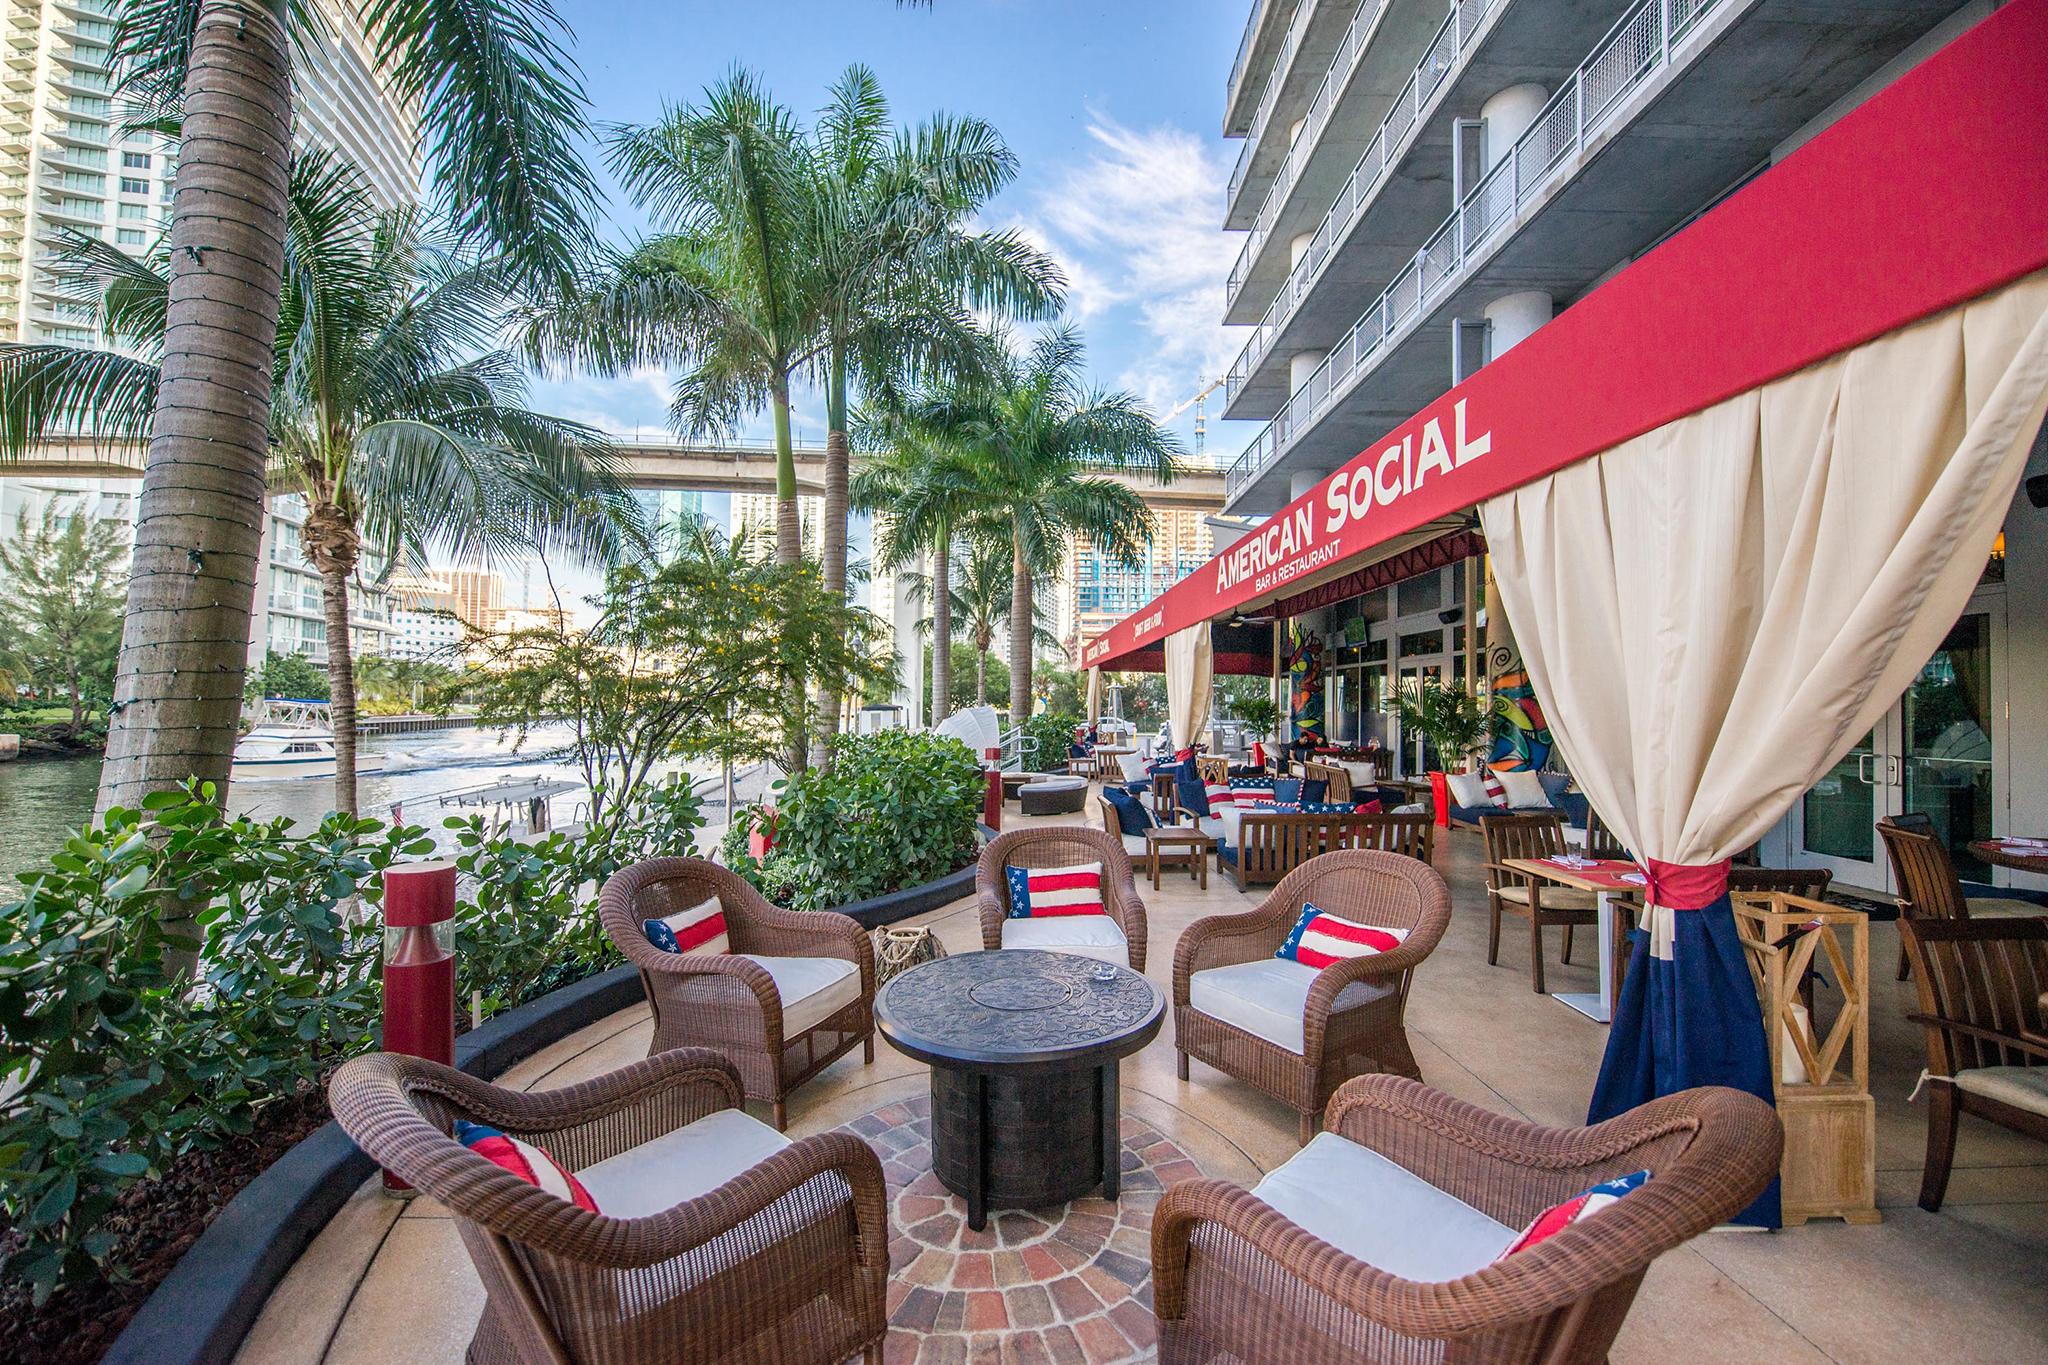 The best Labor Day specials in Miami